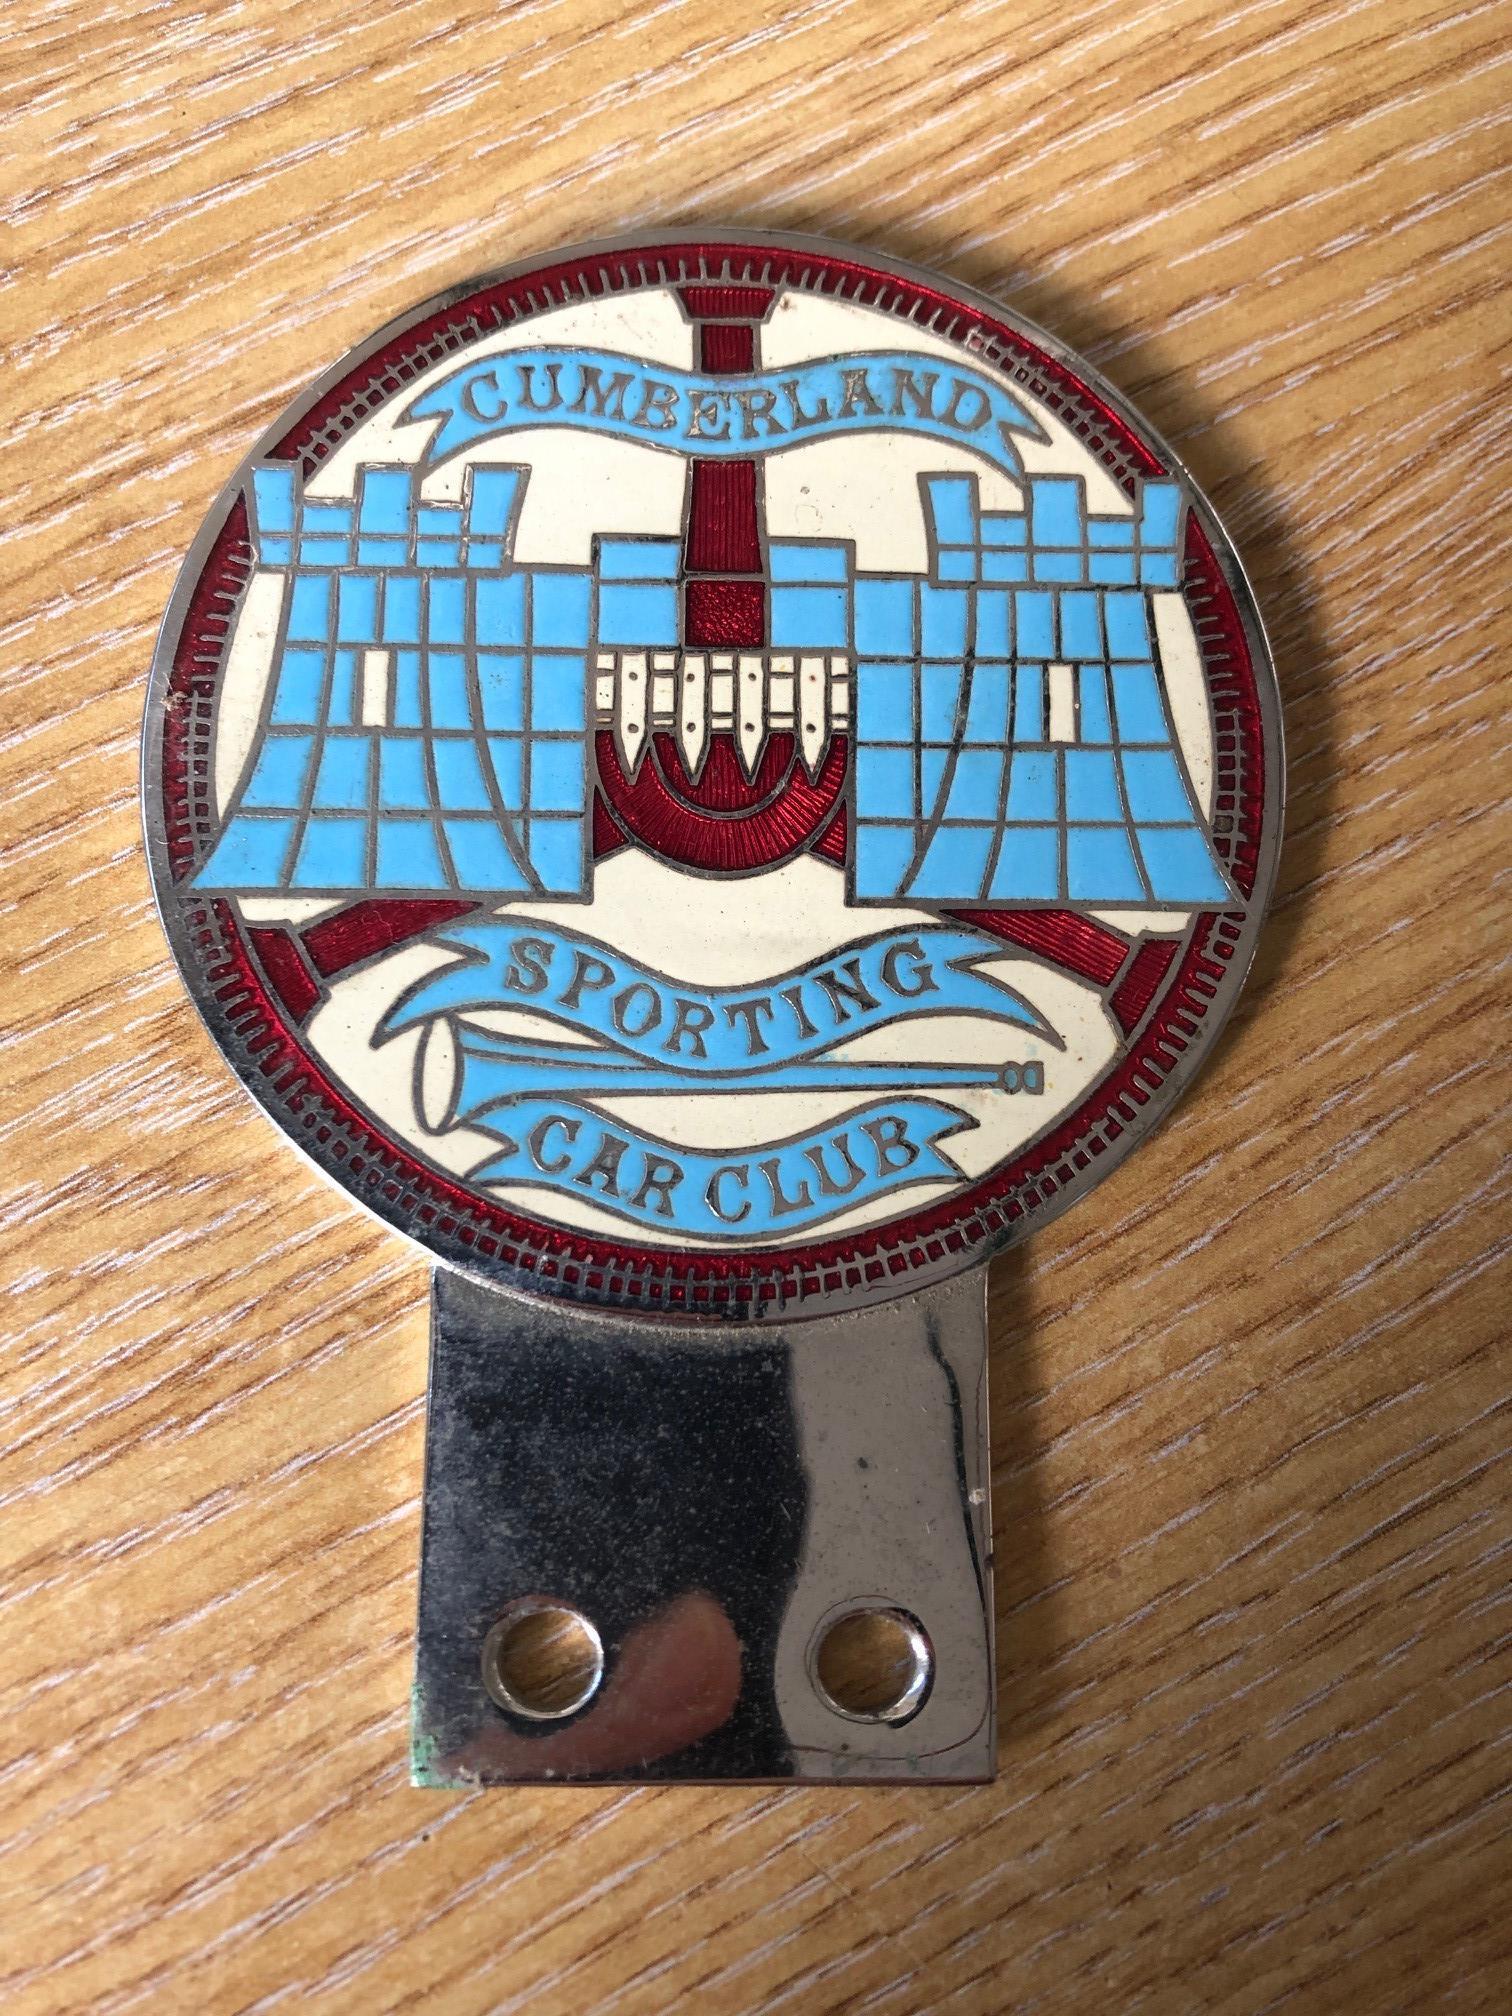 Lot 10A - A Cumberland Sporting Car Club enamelled car bumper badge